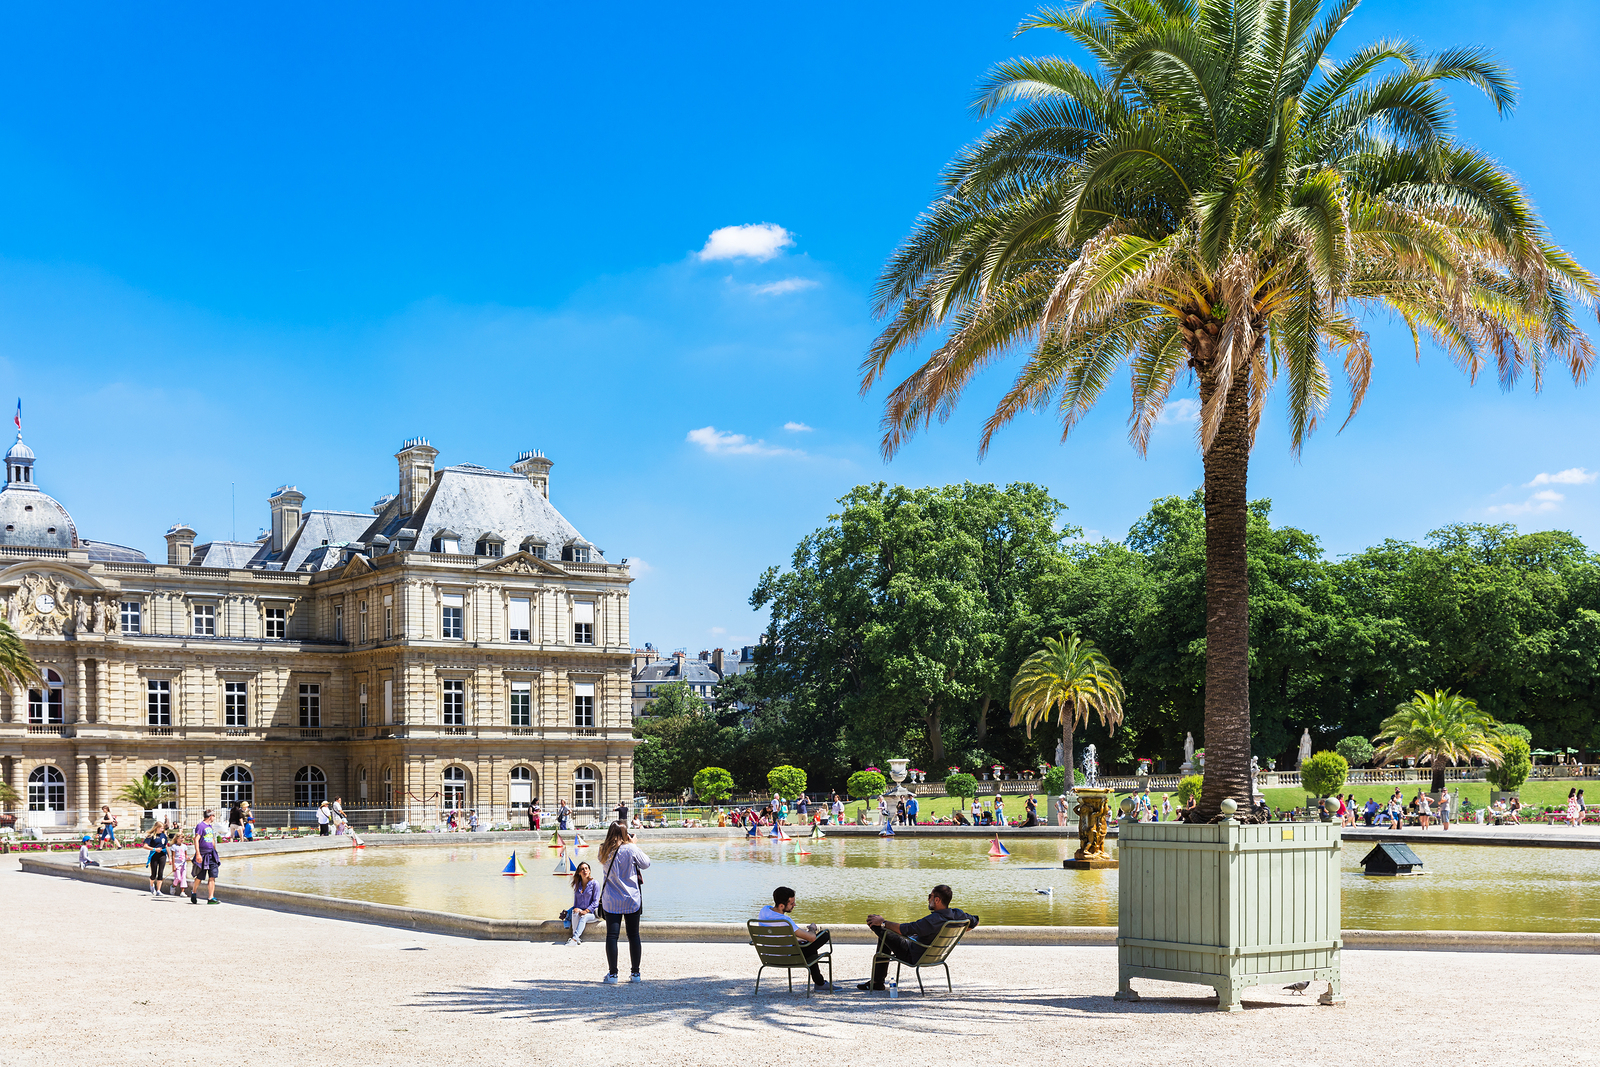 weekend i paris vad göra